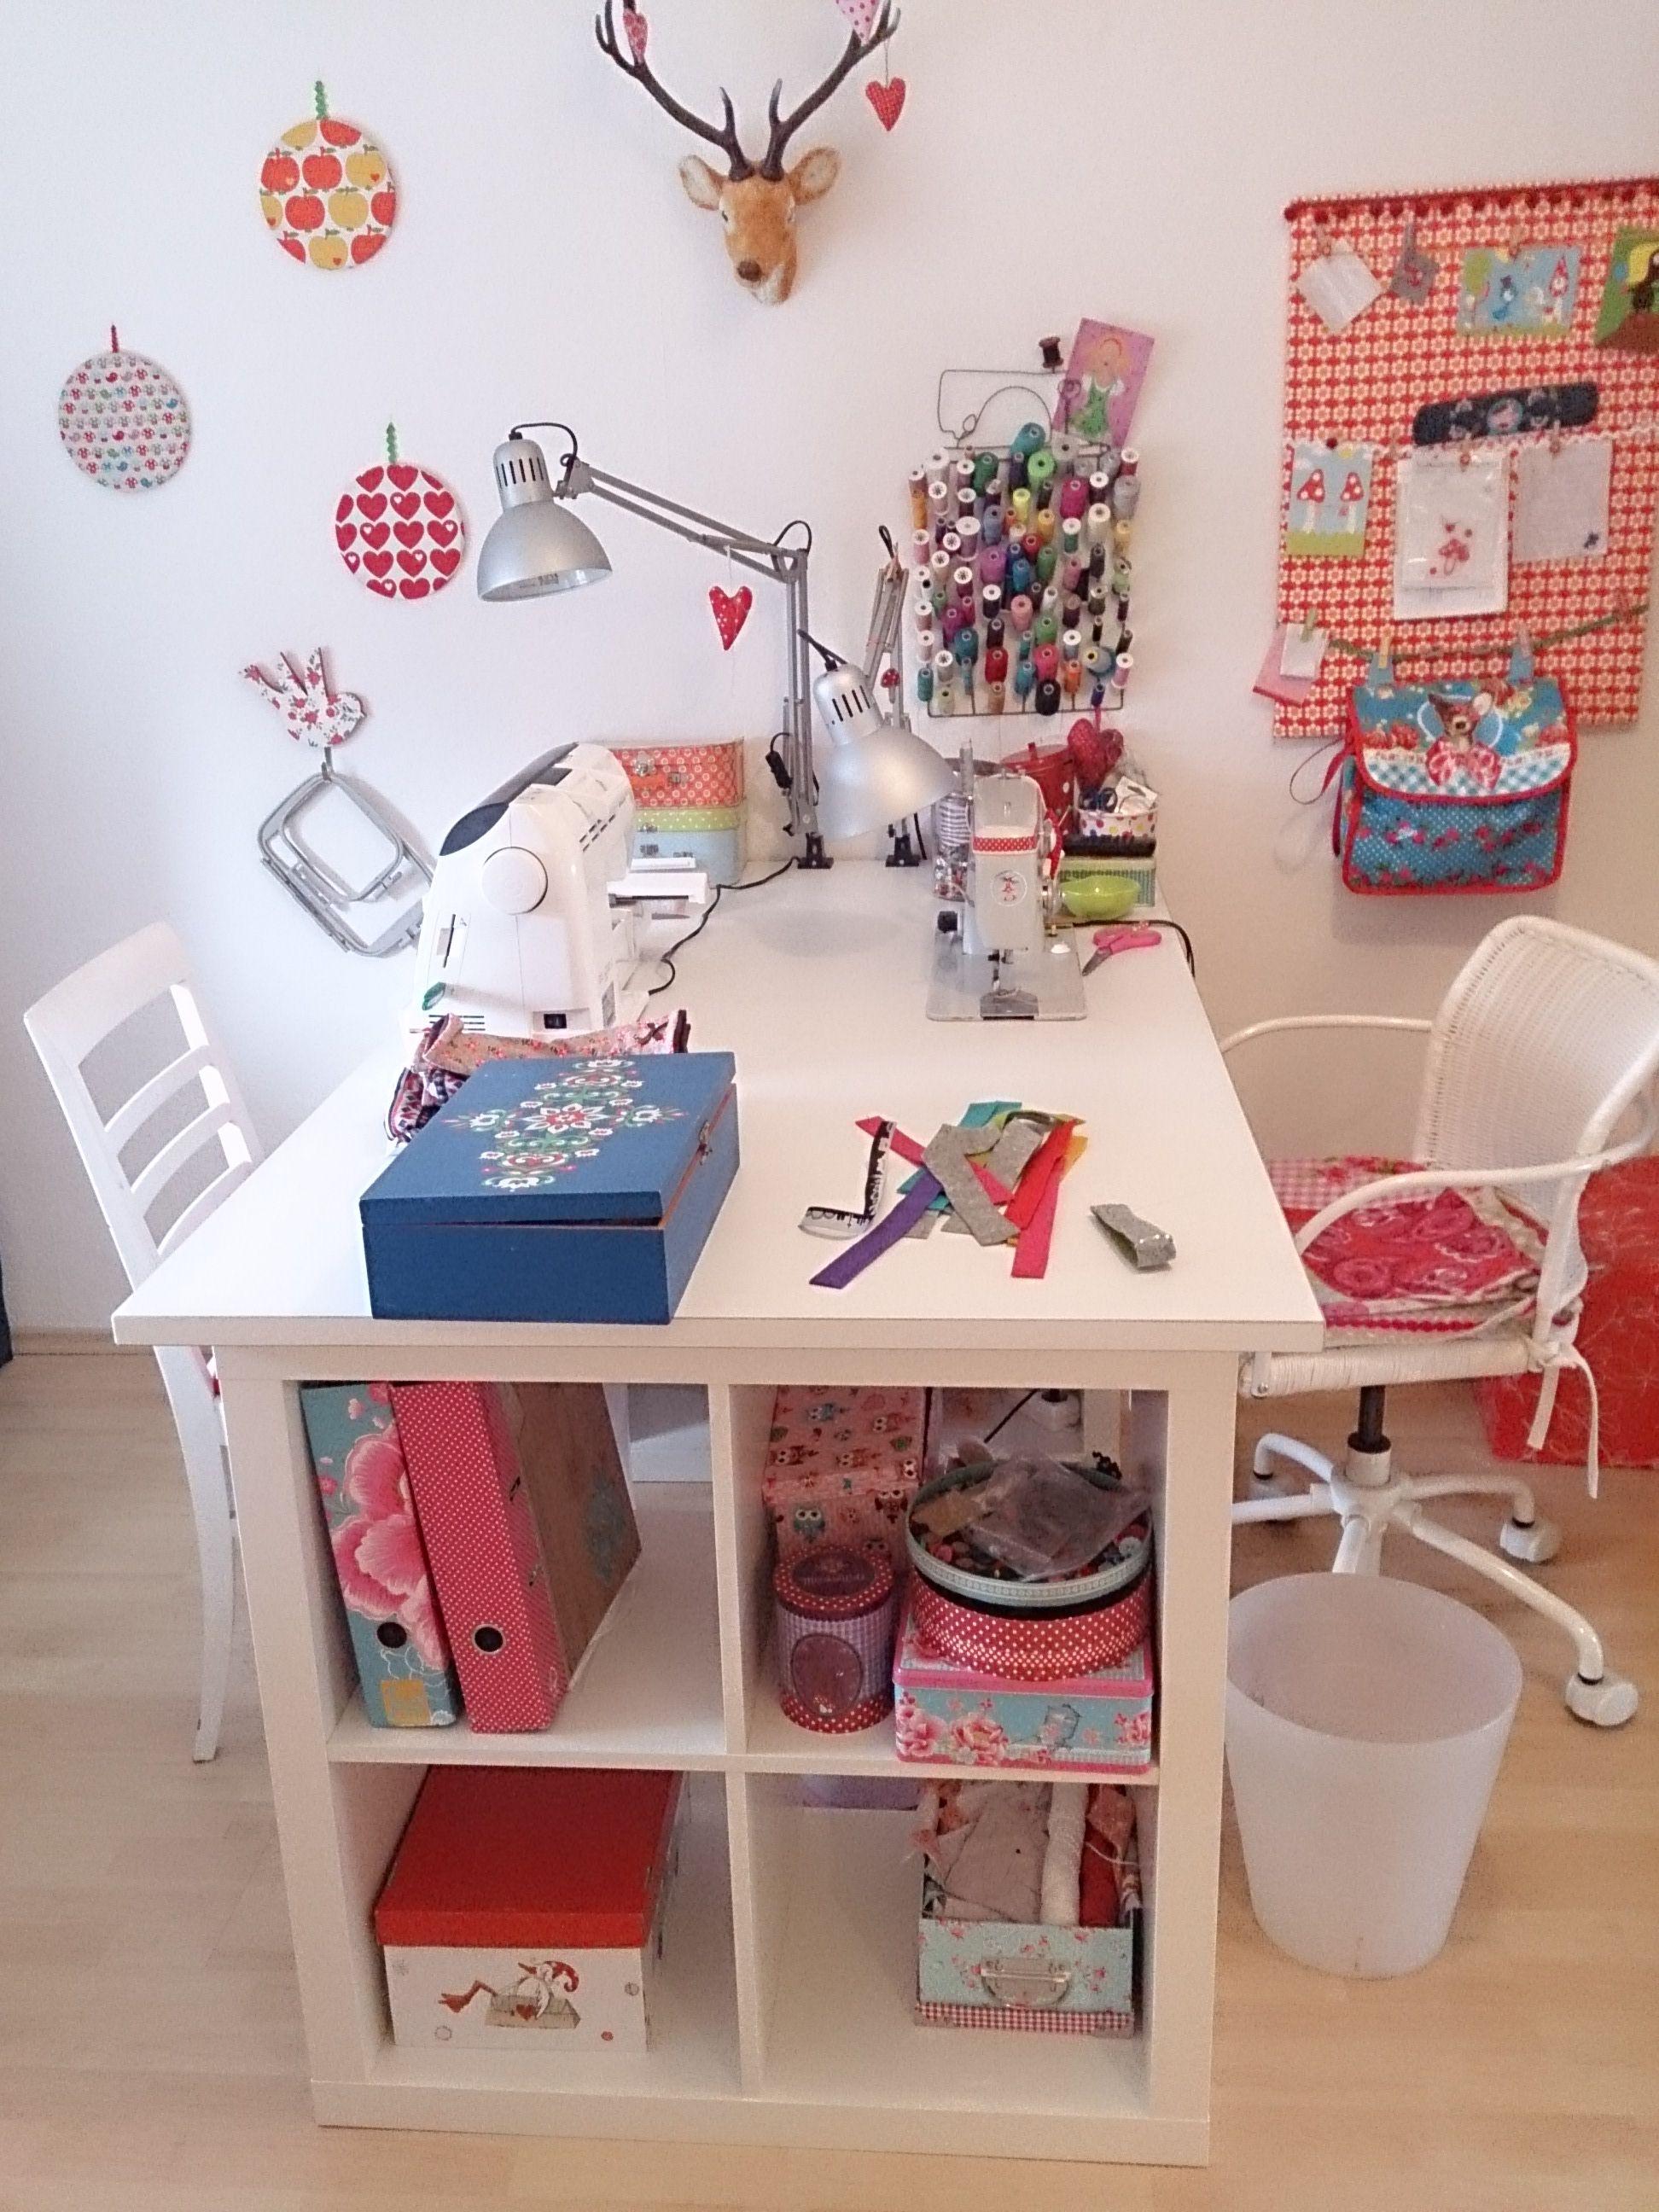 geliebtes n hzimmer mein label maubi 39 s made with love pinterest n hzimmer ikea. Black Bedroom Furniture Sets. Home Design Ideas